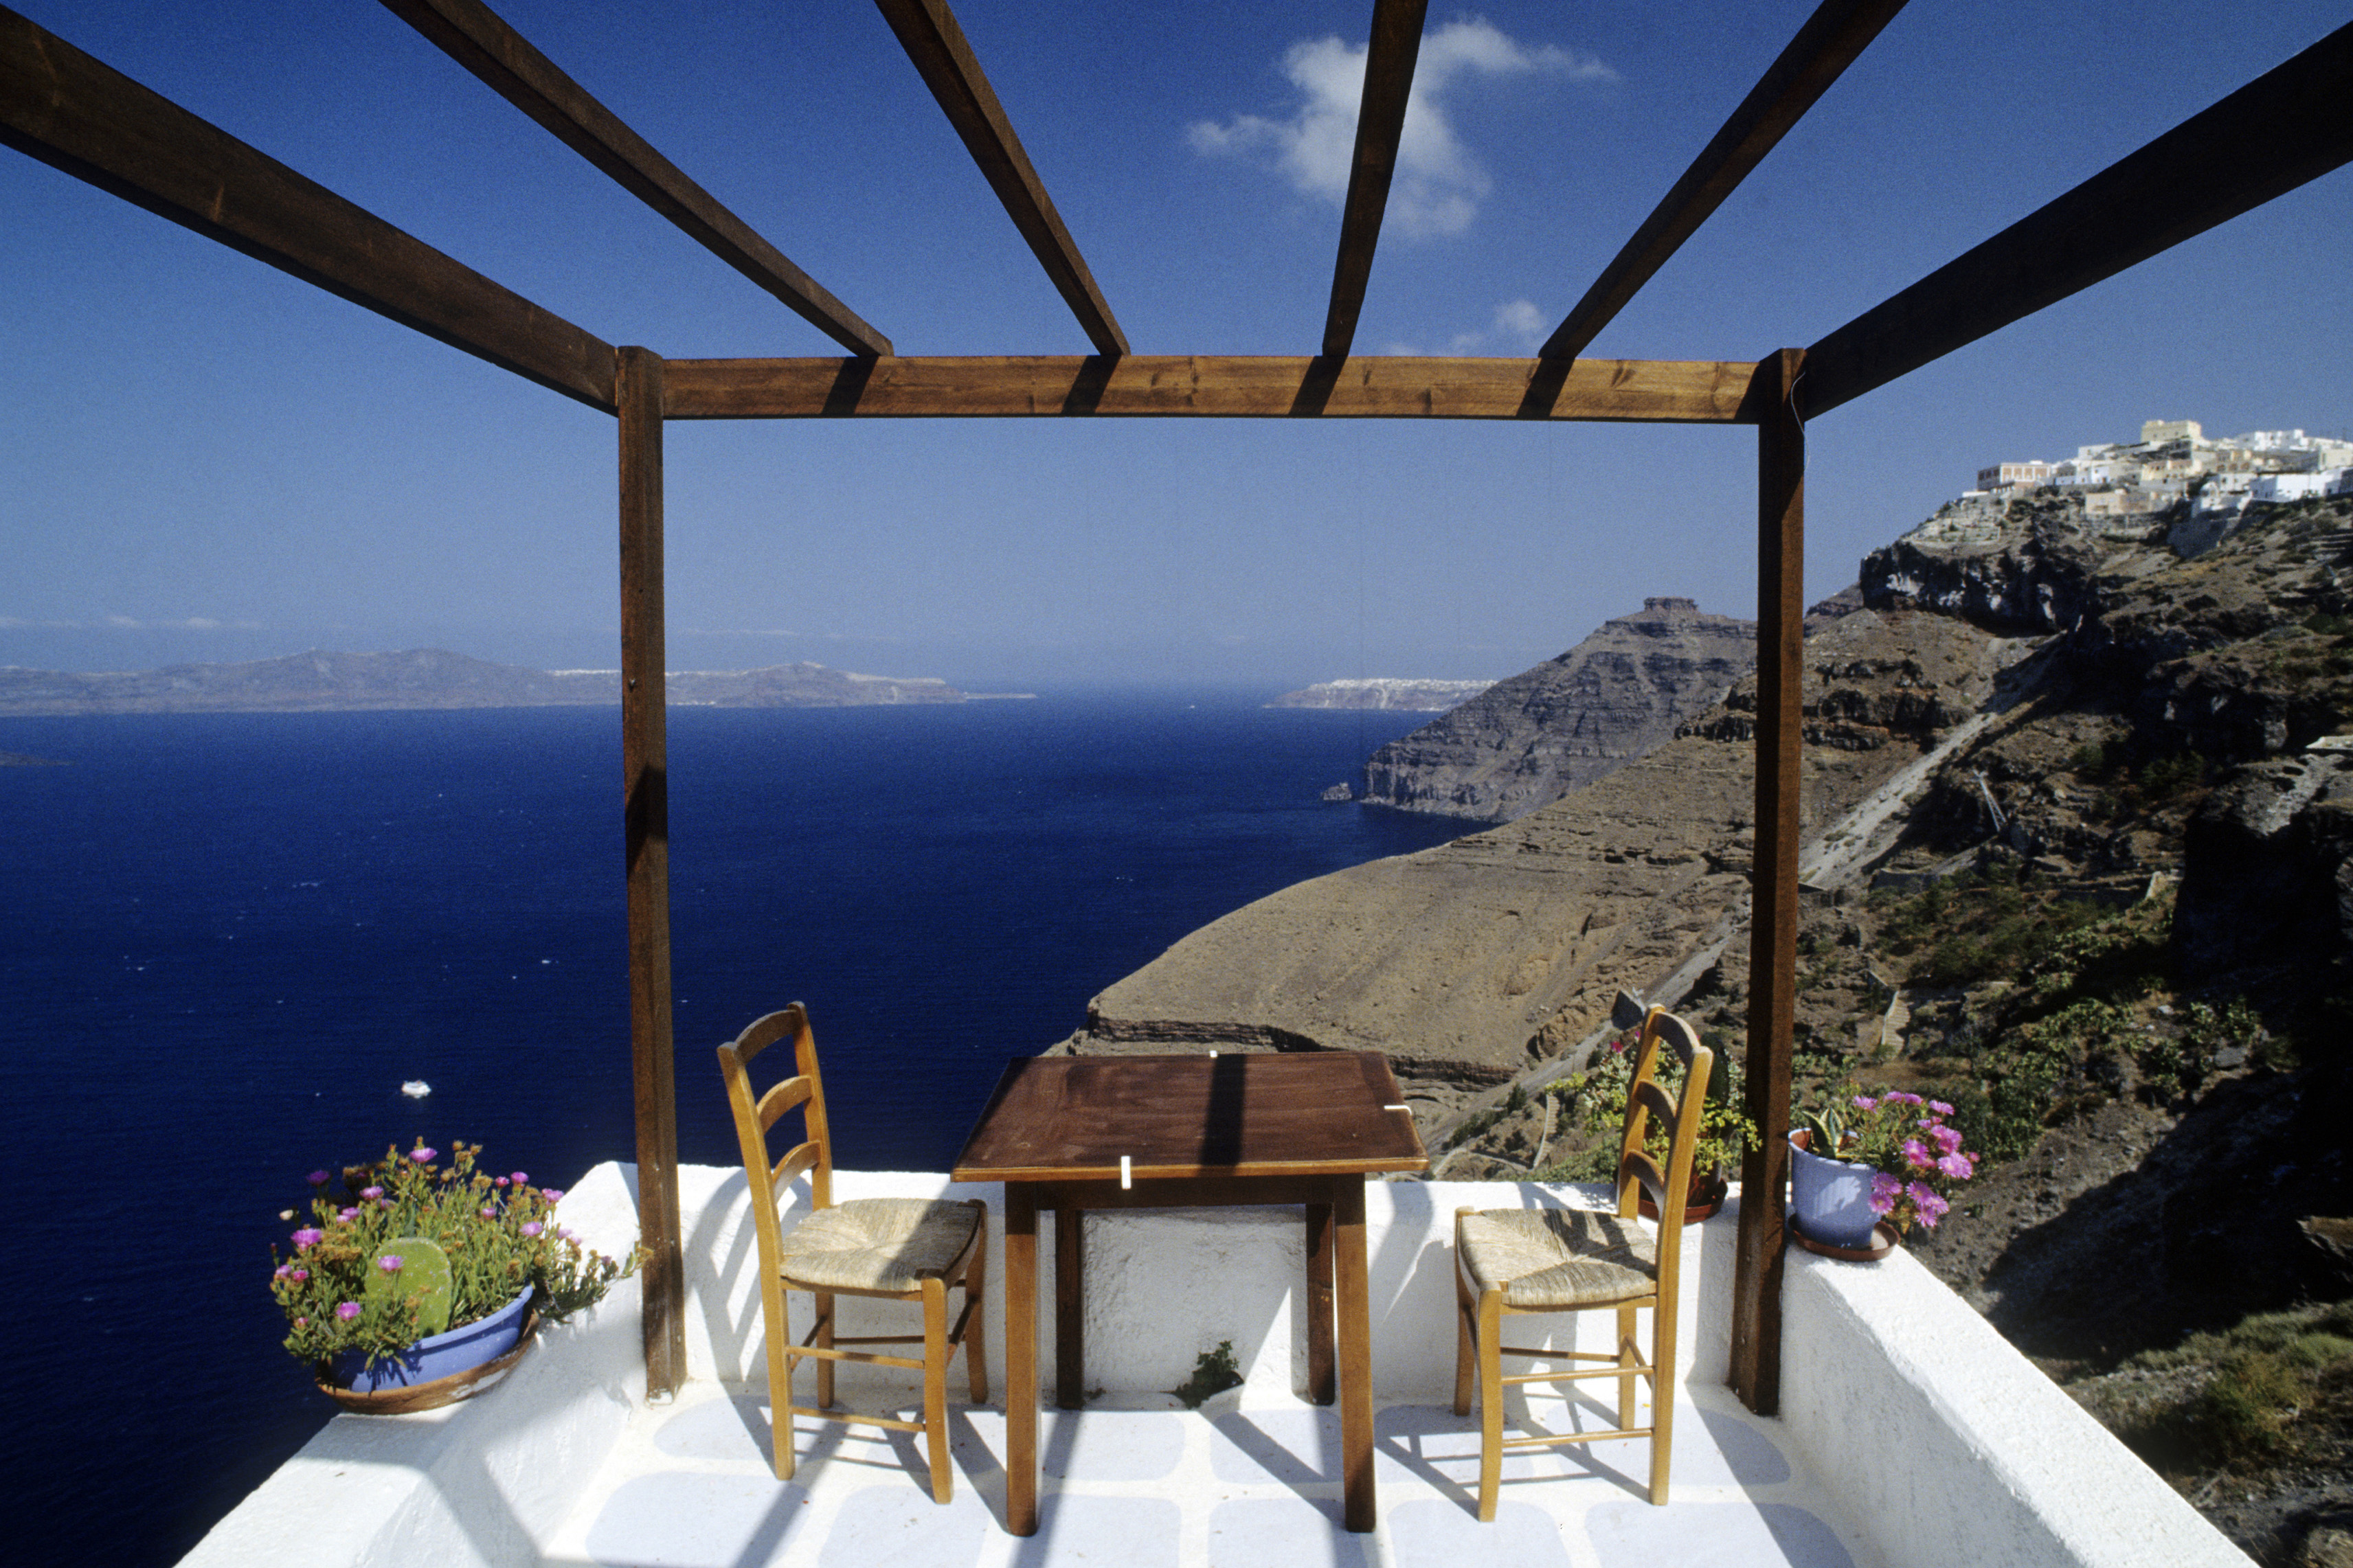 greece, santorini, fira, terrace looking the sea